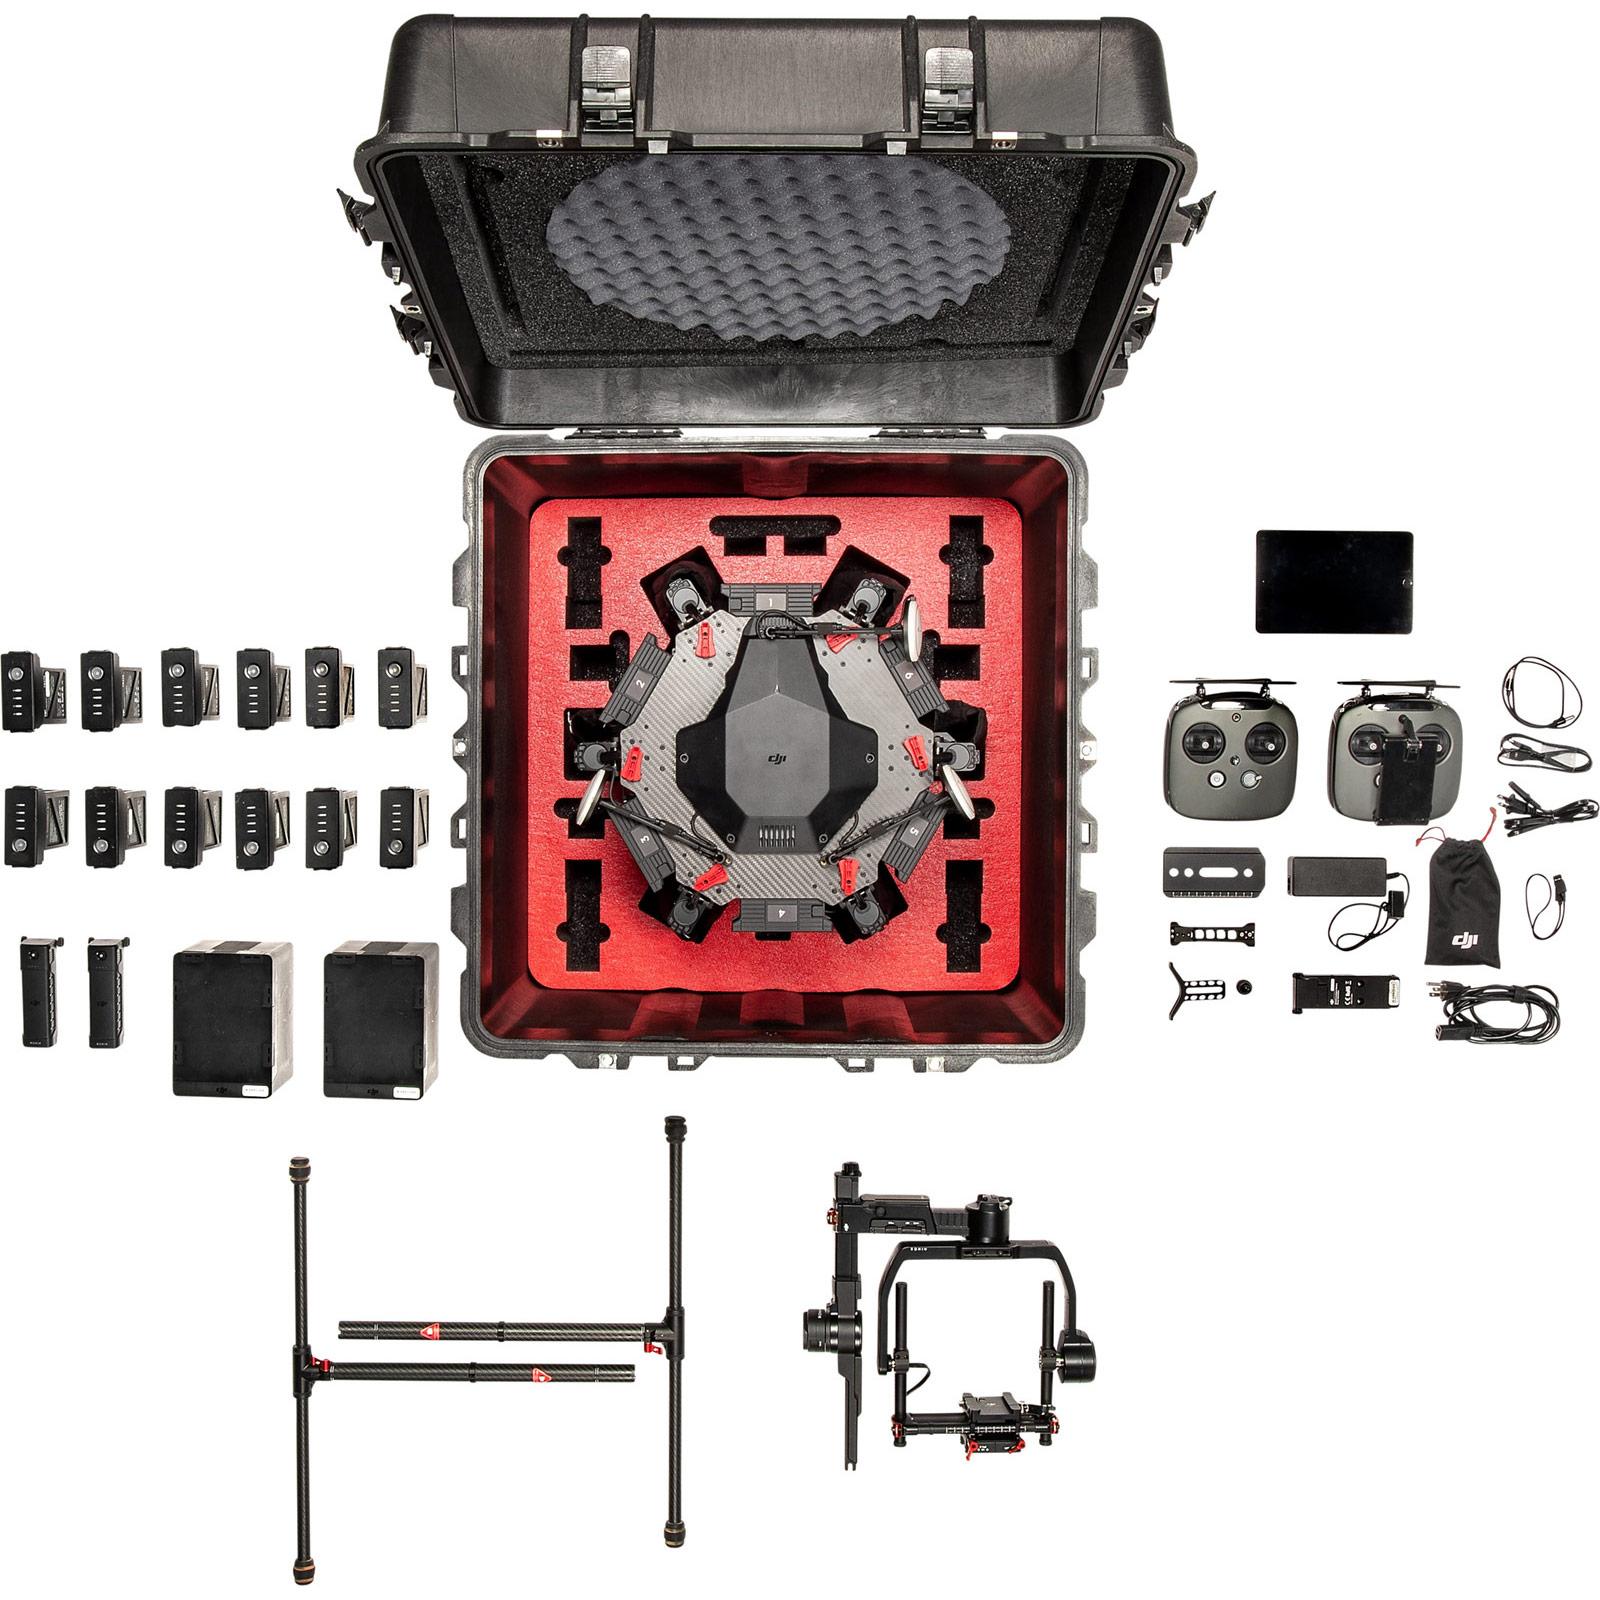 pelcian matrice 600 drone professional hard case